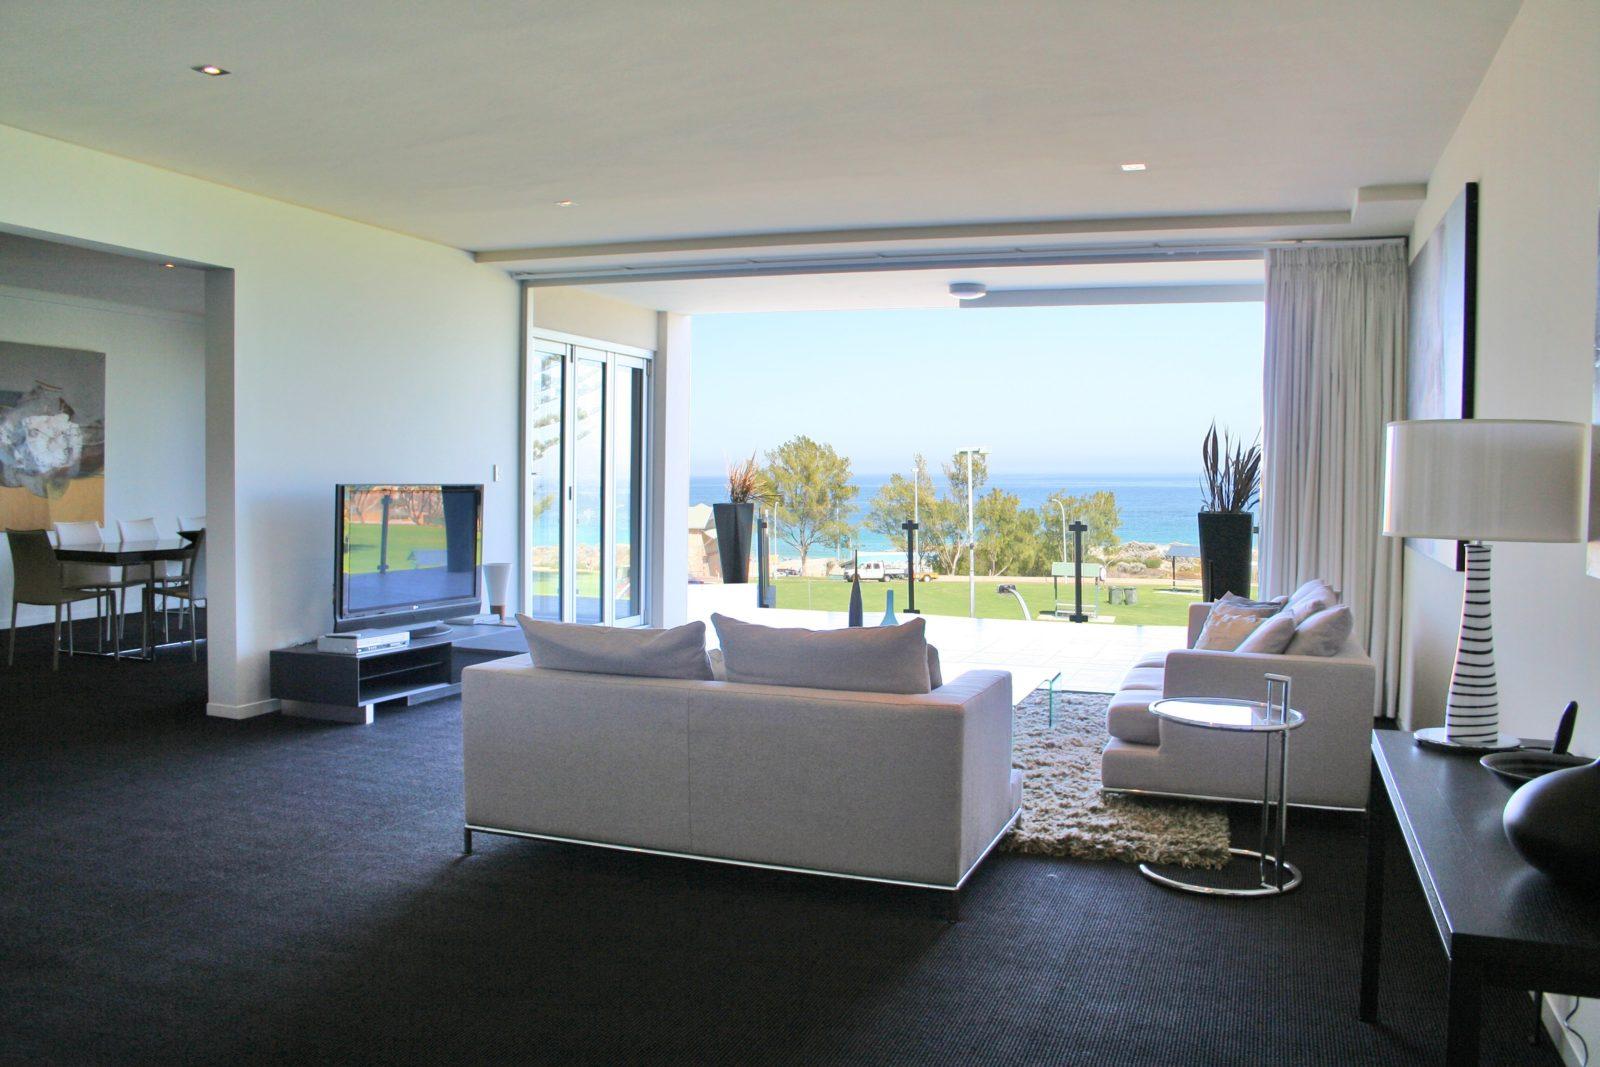 Clarion Suites Mullaloo Beach, Mullaloo, Western Australia